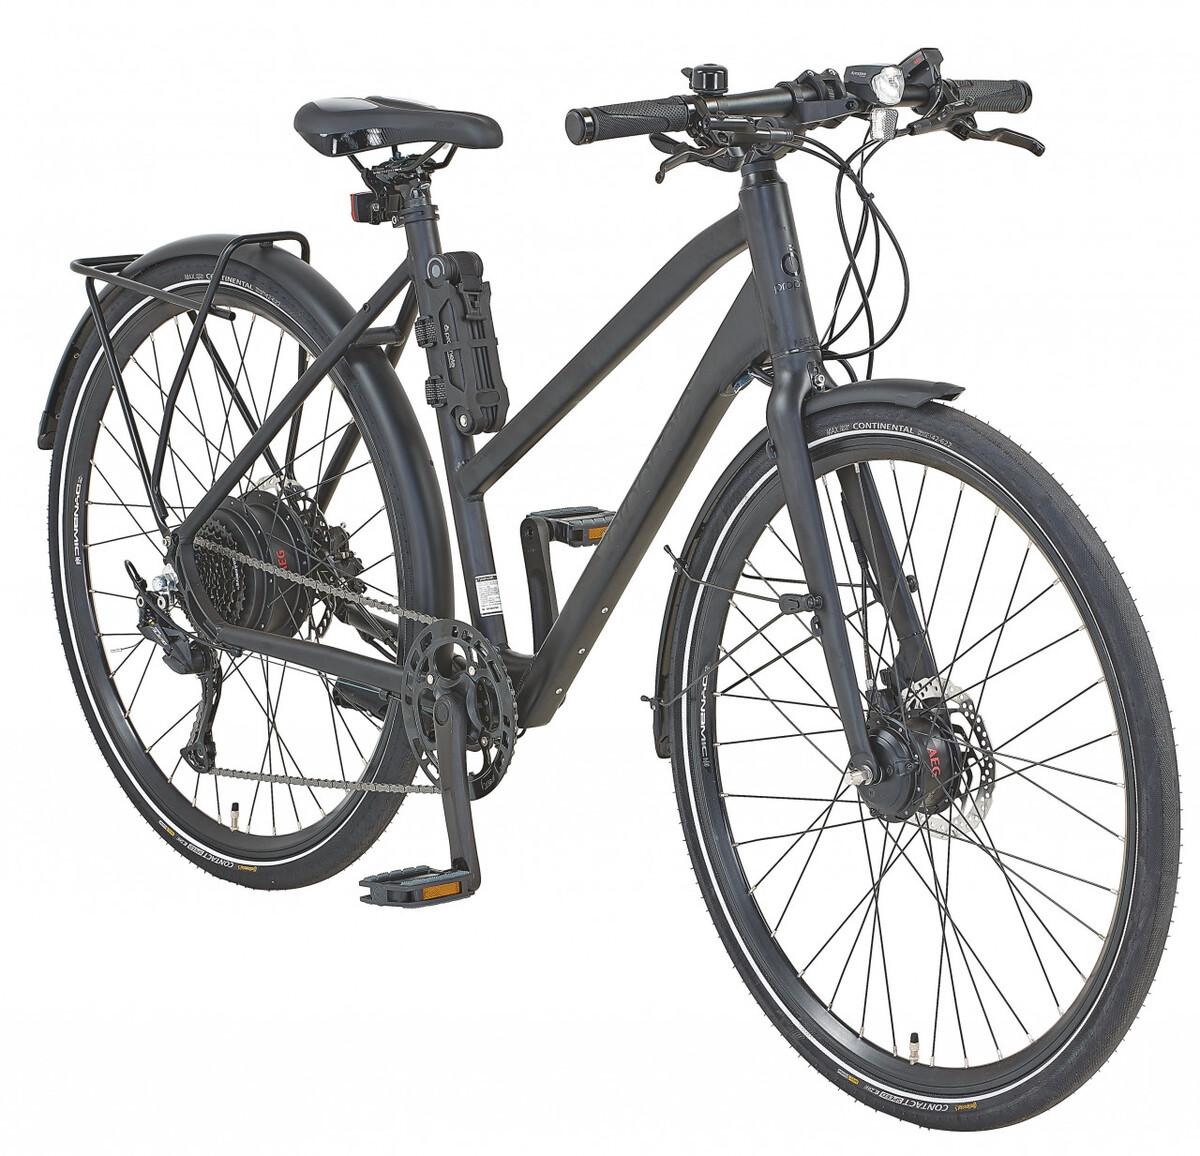 Bild 1 von Prophete Damen City E-Bike Urbanicer 28'' 21.EMU.10